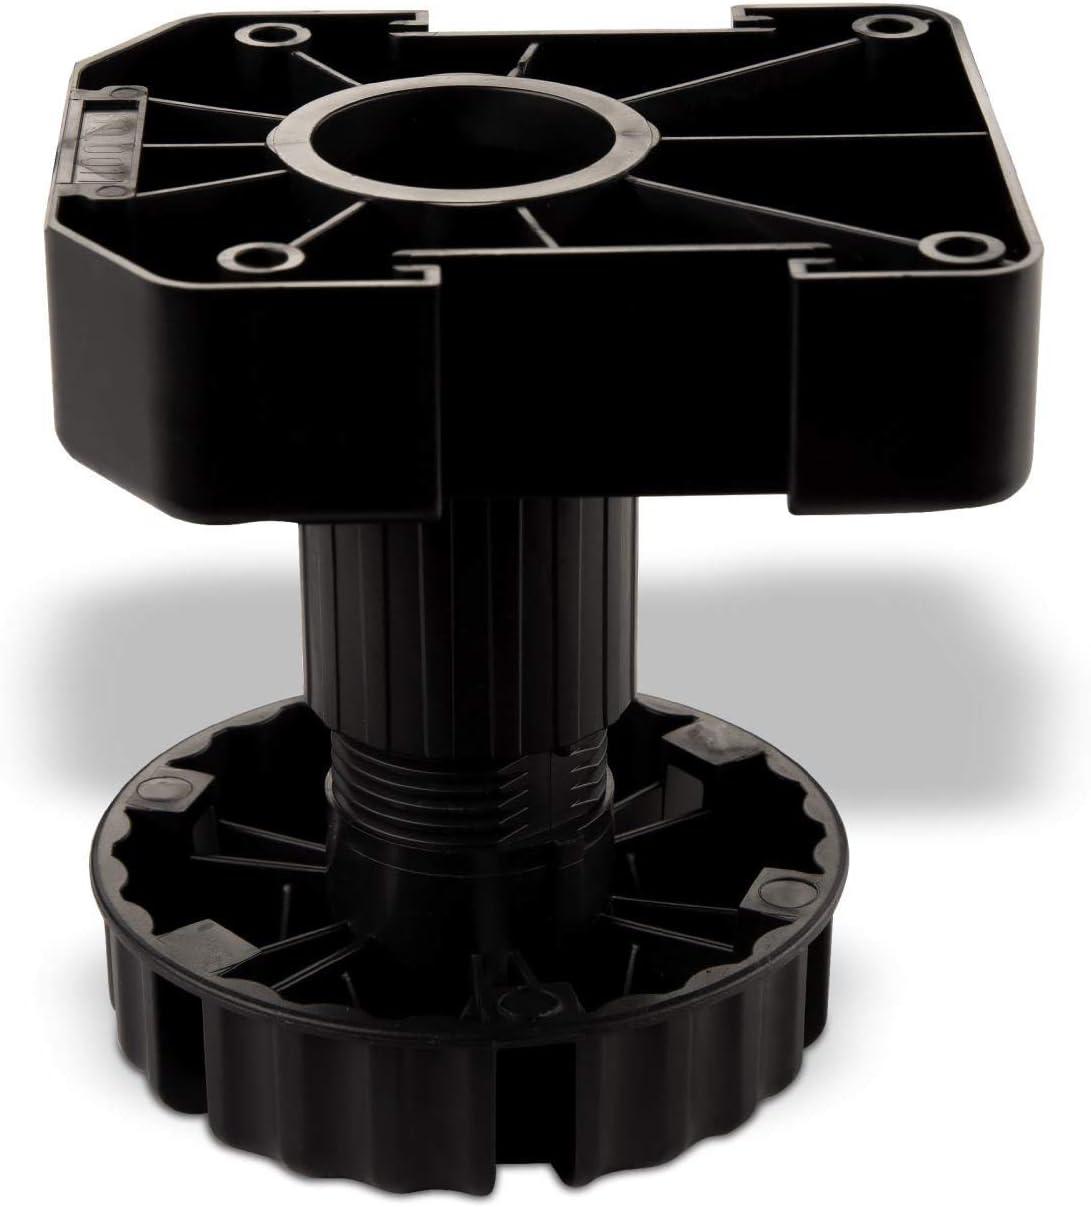 SO-TECH® Juego de 4 Zócalo Mueble Cocina Patas Plásticas Pies para Mueble Patas Regulables Alto 100 mm